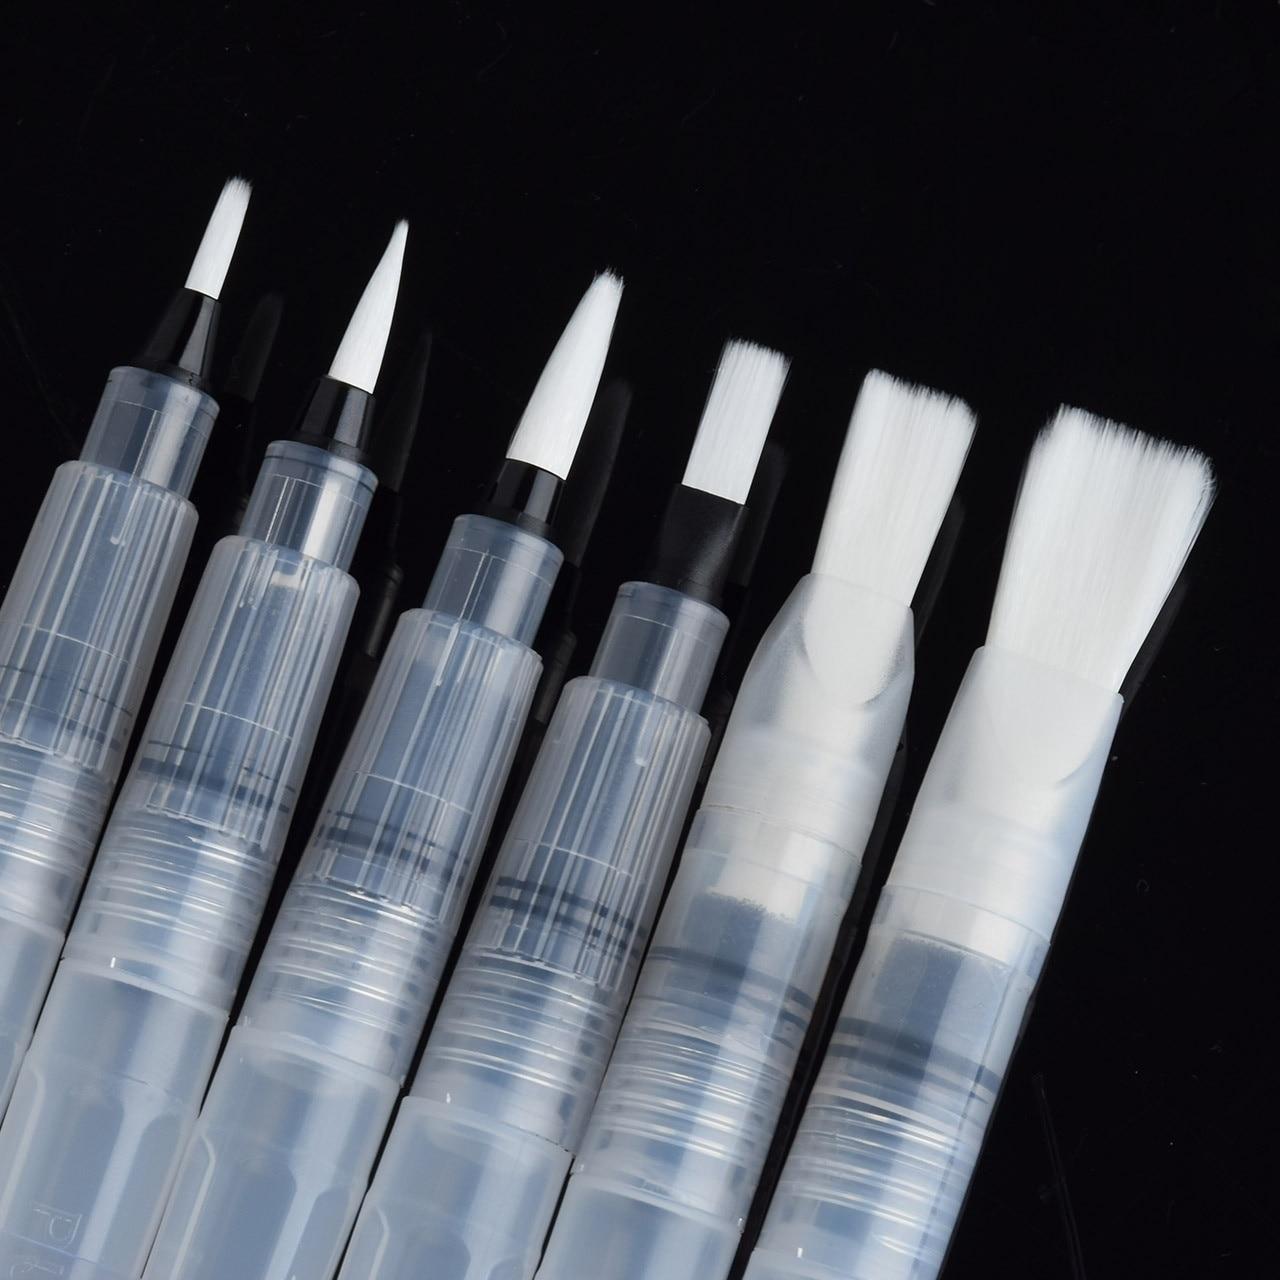 6Pcs/Set Plastic Water Storage Soft Brush Drawing Paint Watercolor Calligraphy Pen Flat/Round